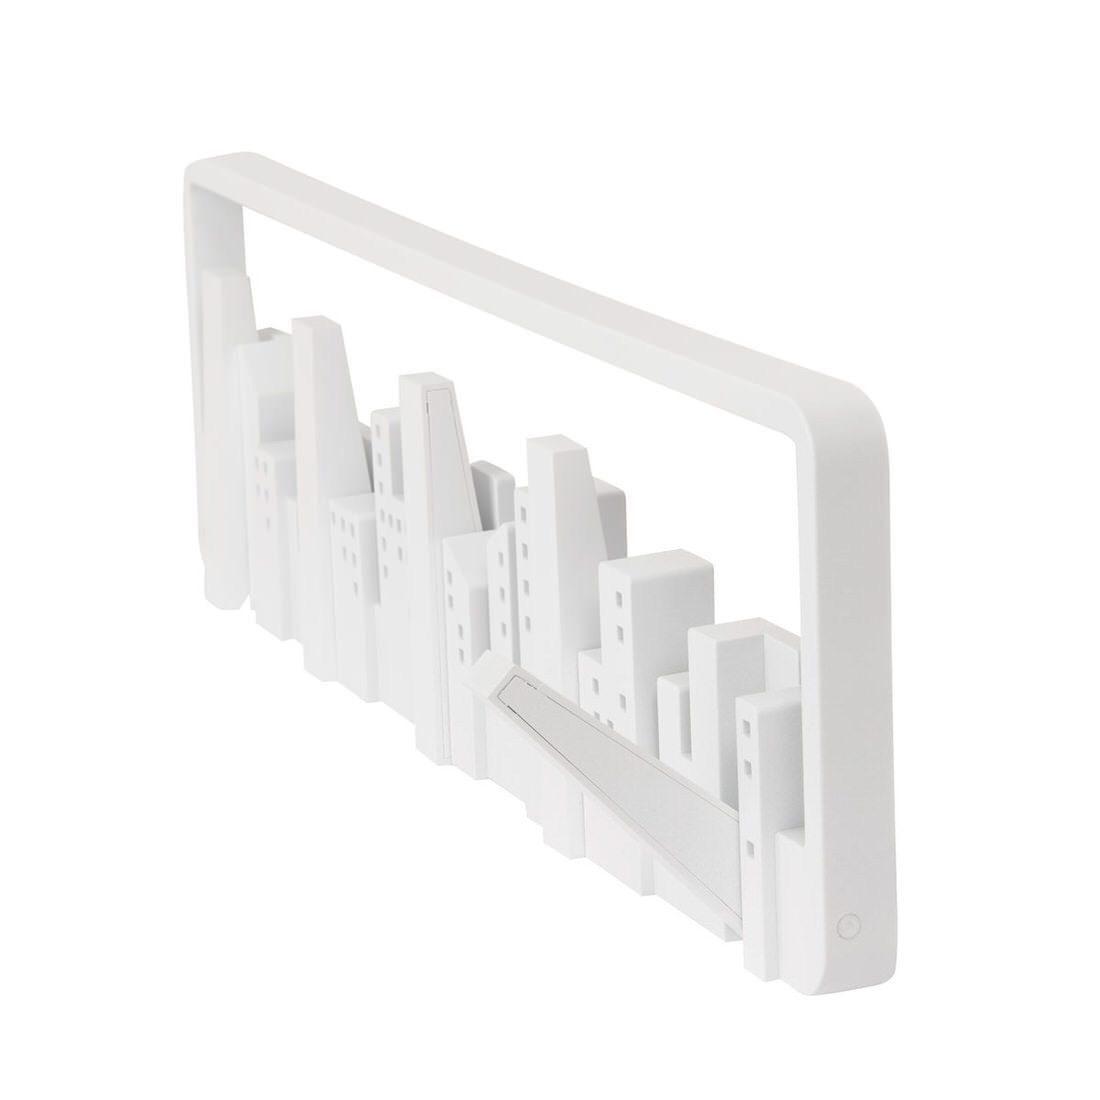 Umbra Skyline Multi Hook White